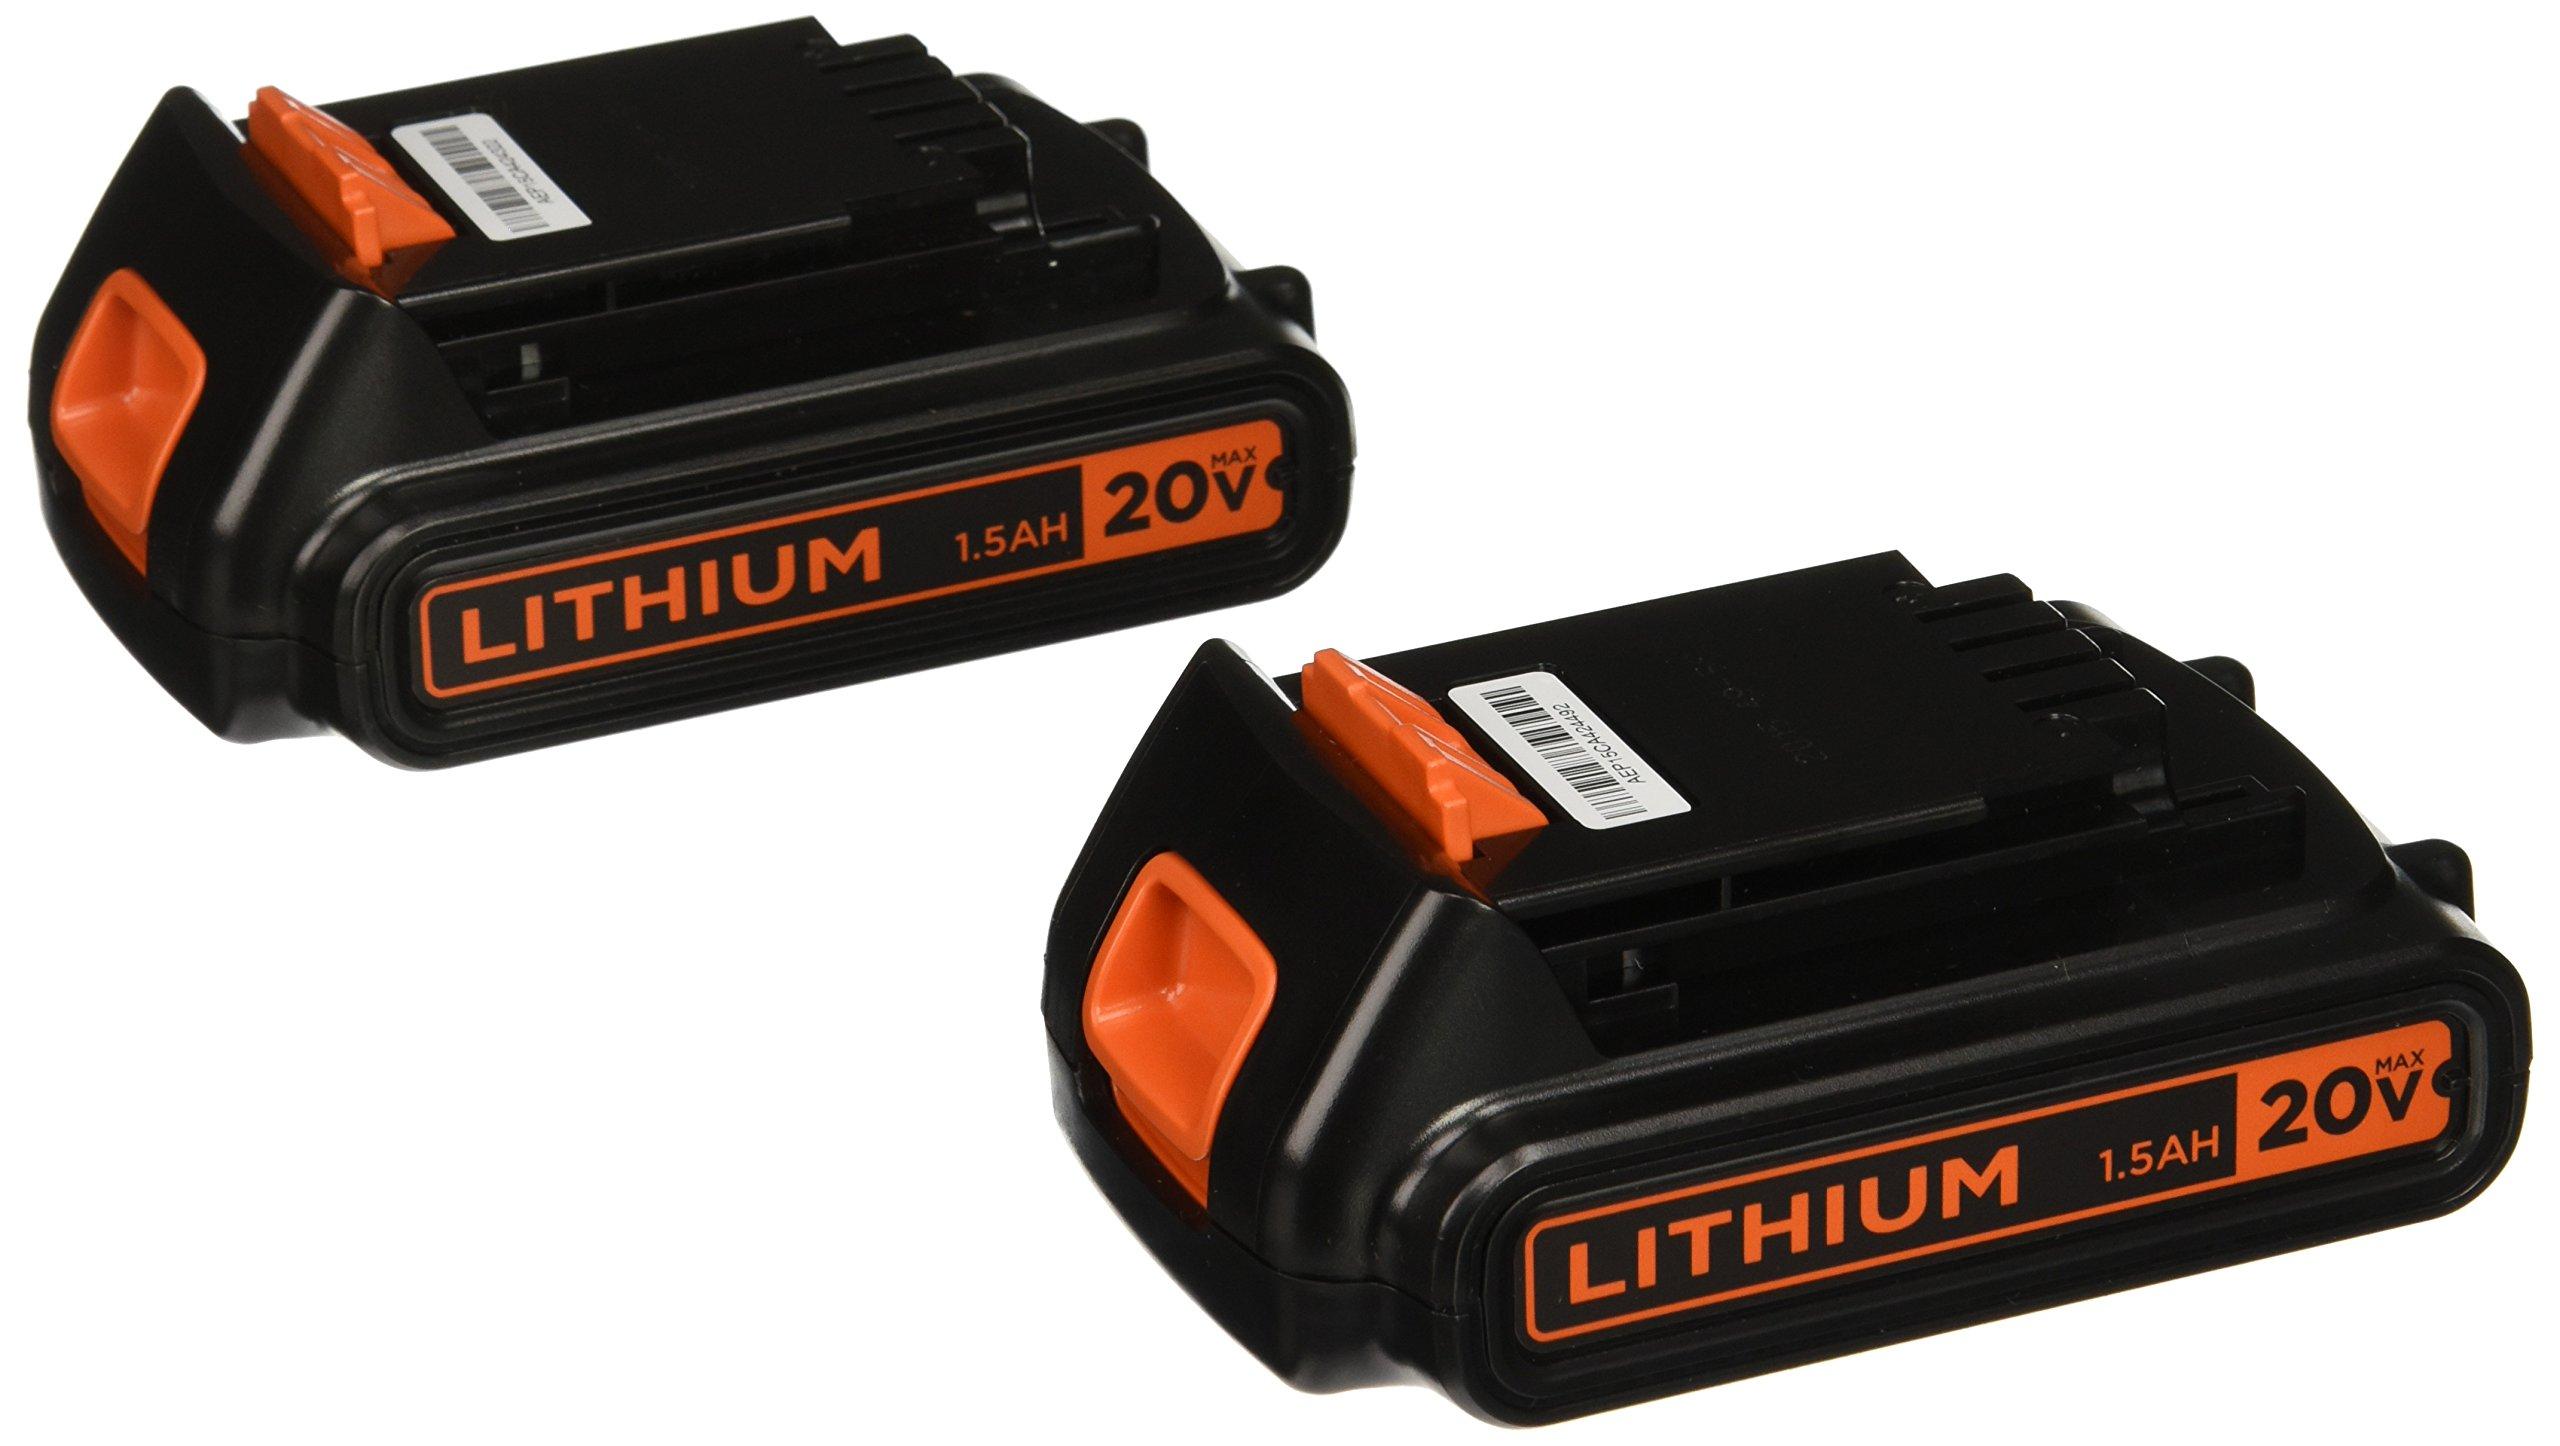 2 Baterias Originales BLACKDECKER 20v 1.3ah LBXR20B-2